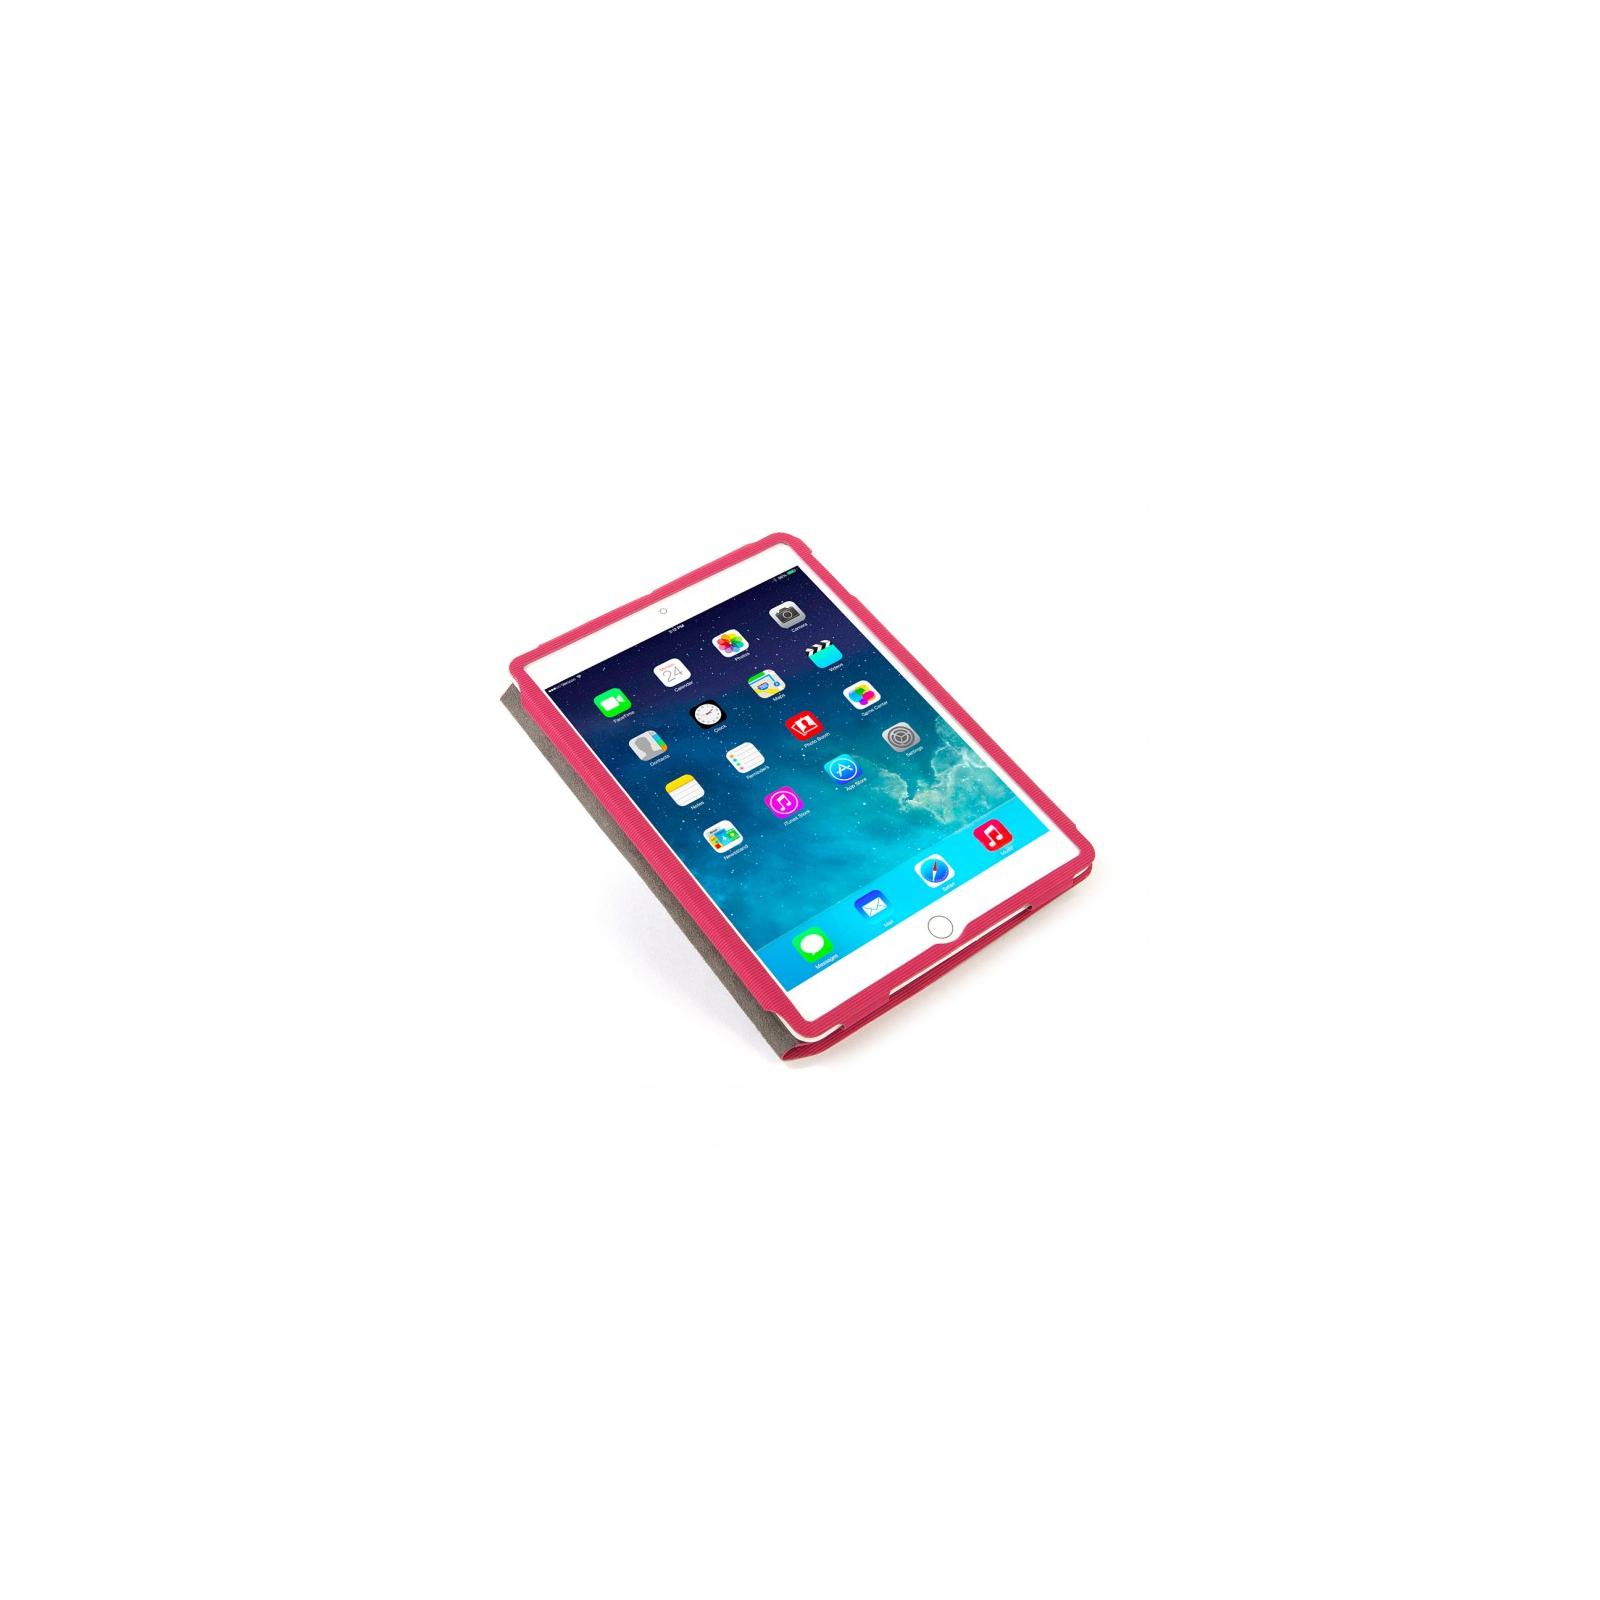 Чехол для планшета Tucano iPad Air Fresco Fusica (IPD5F-F) изображение 6